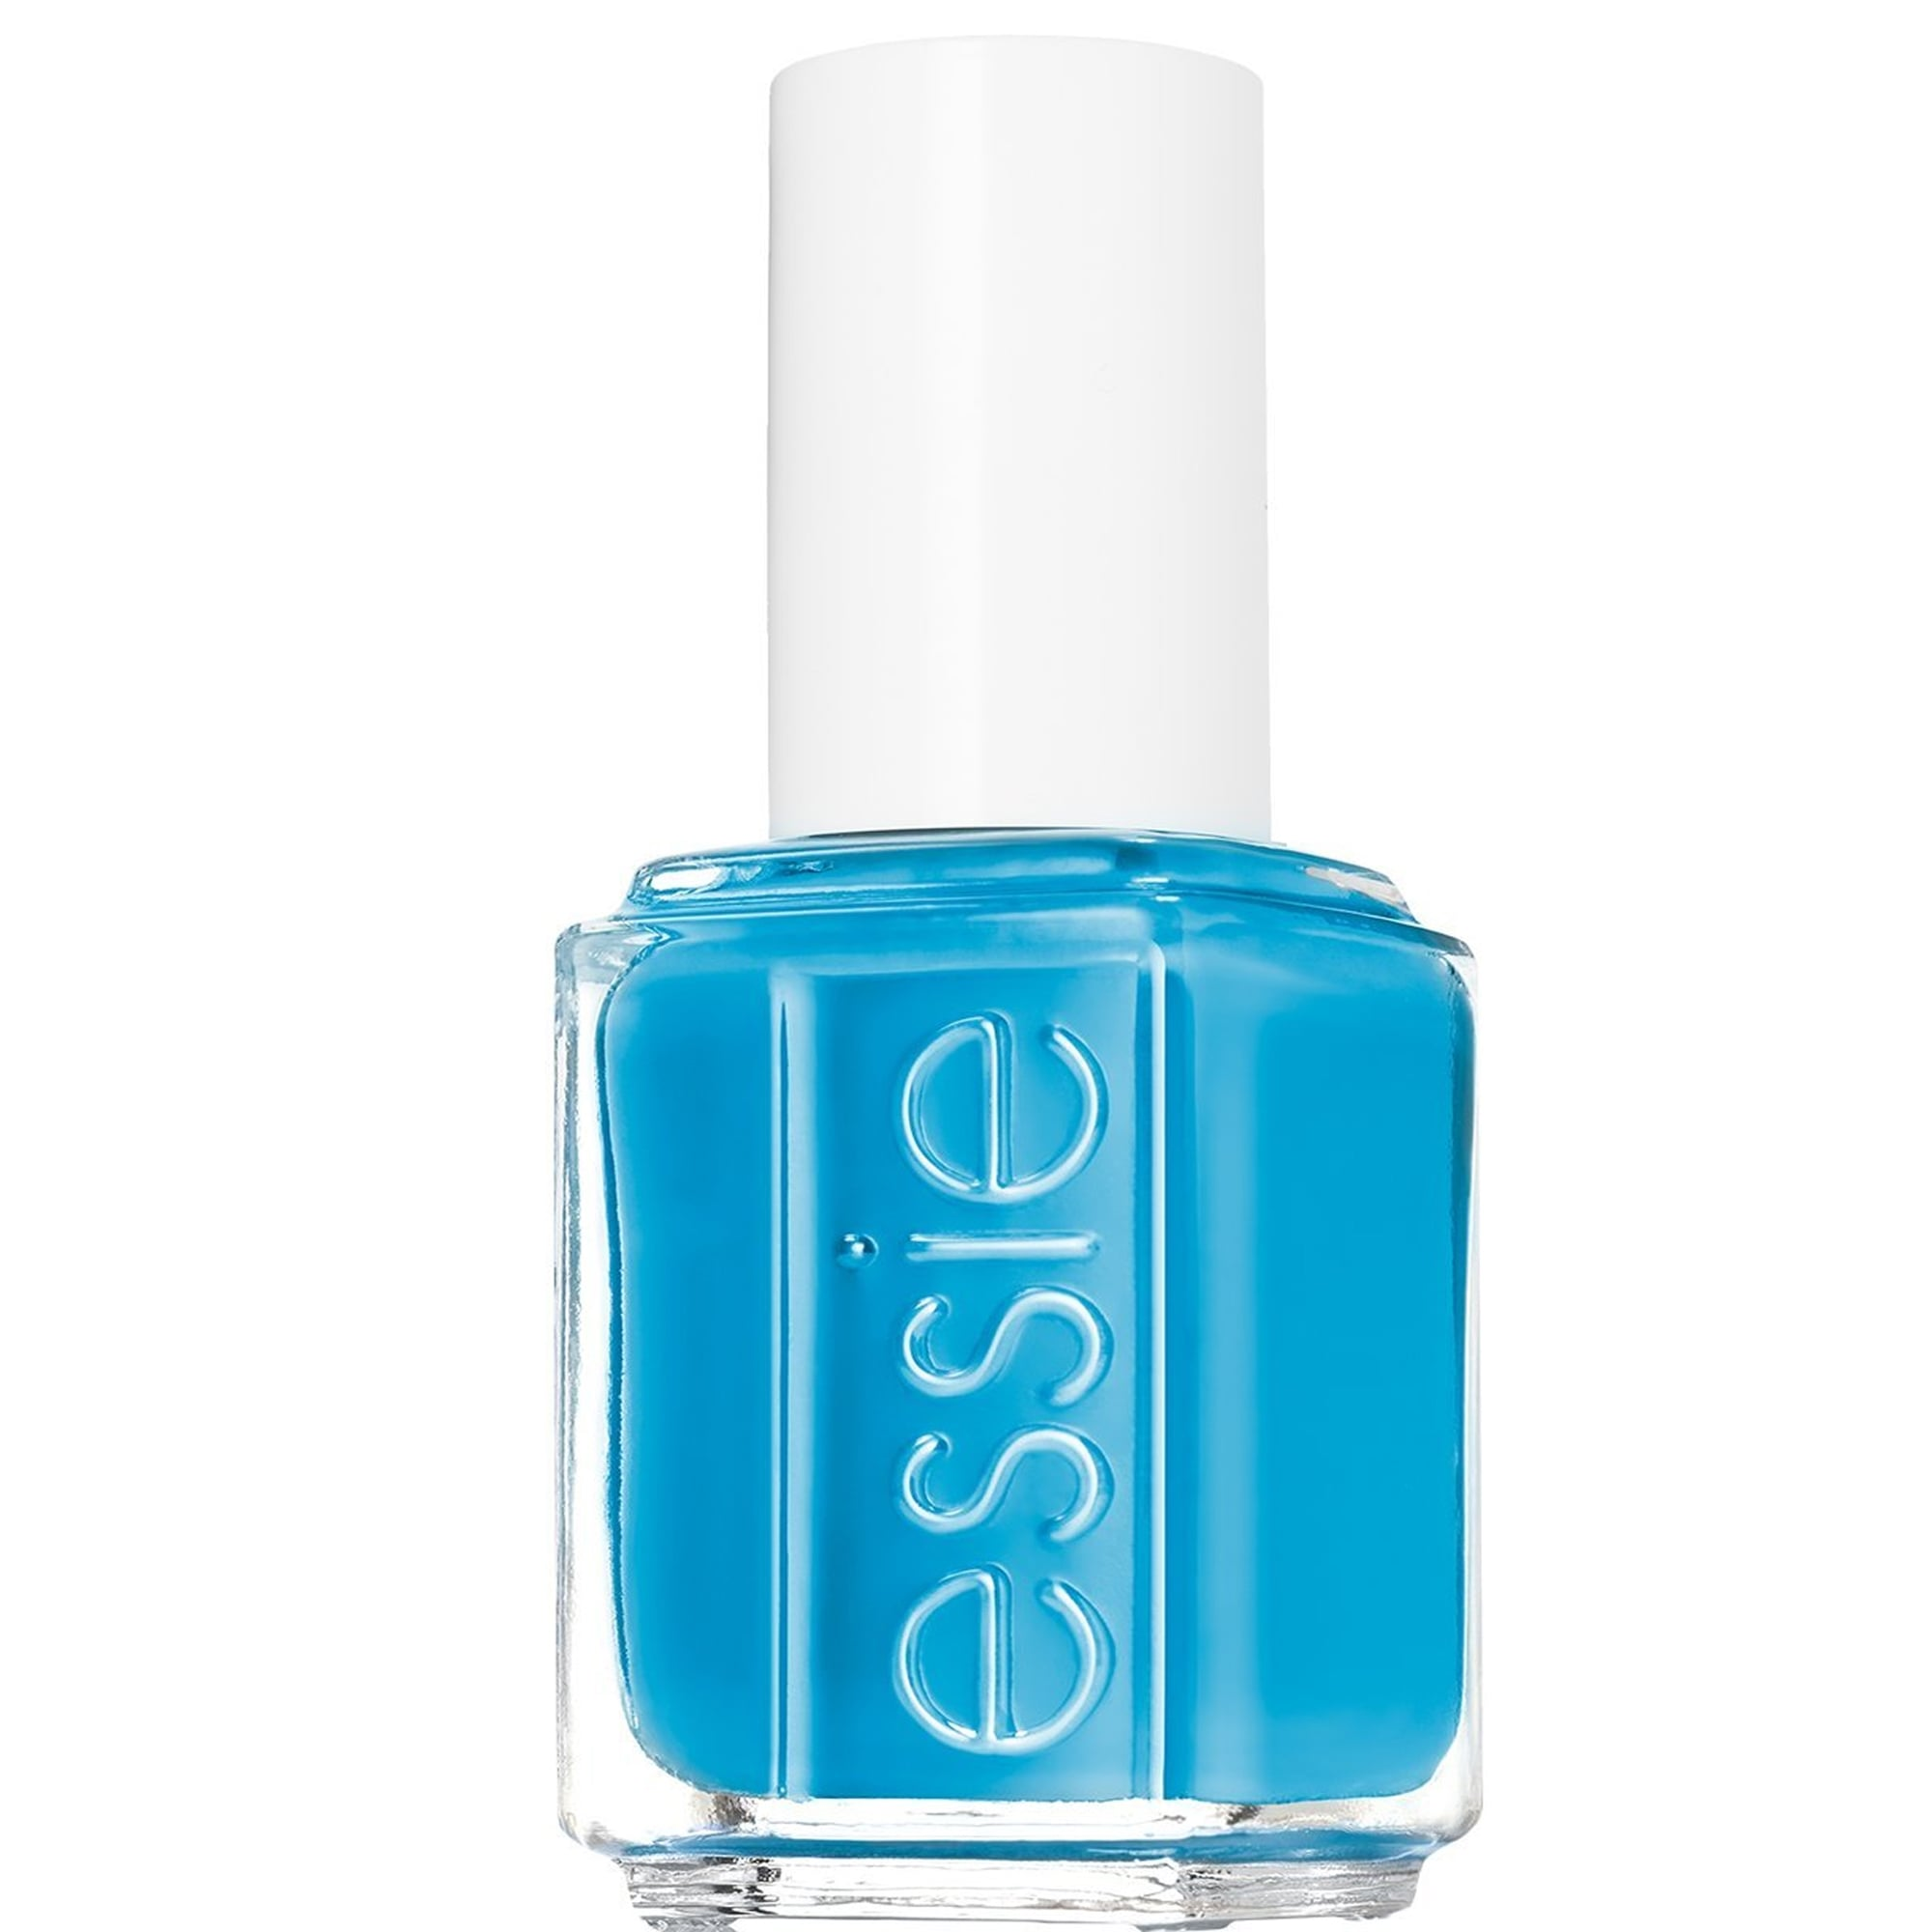 Essie Professional Quality Nail Polish - Strut Your Stuff 15ml (873)